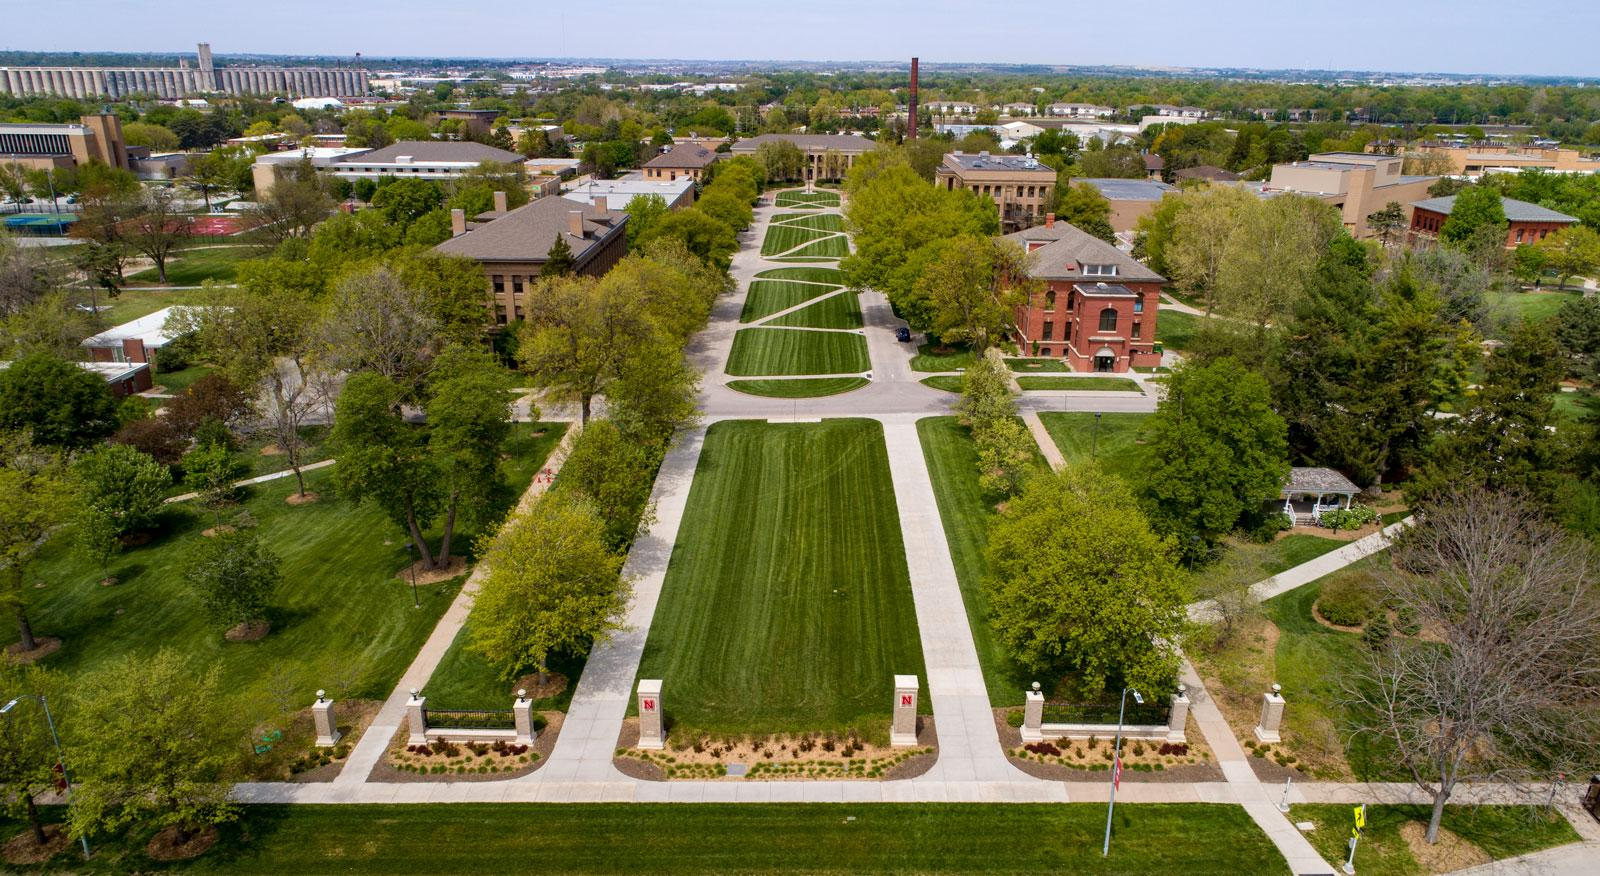 Aerial photo of East Campus